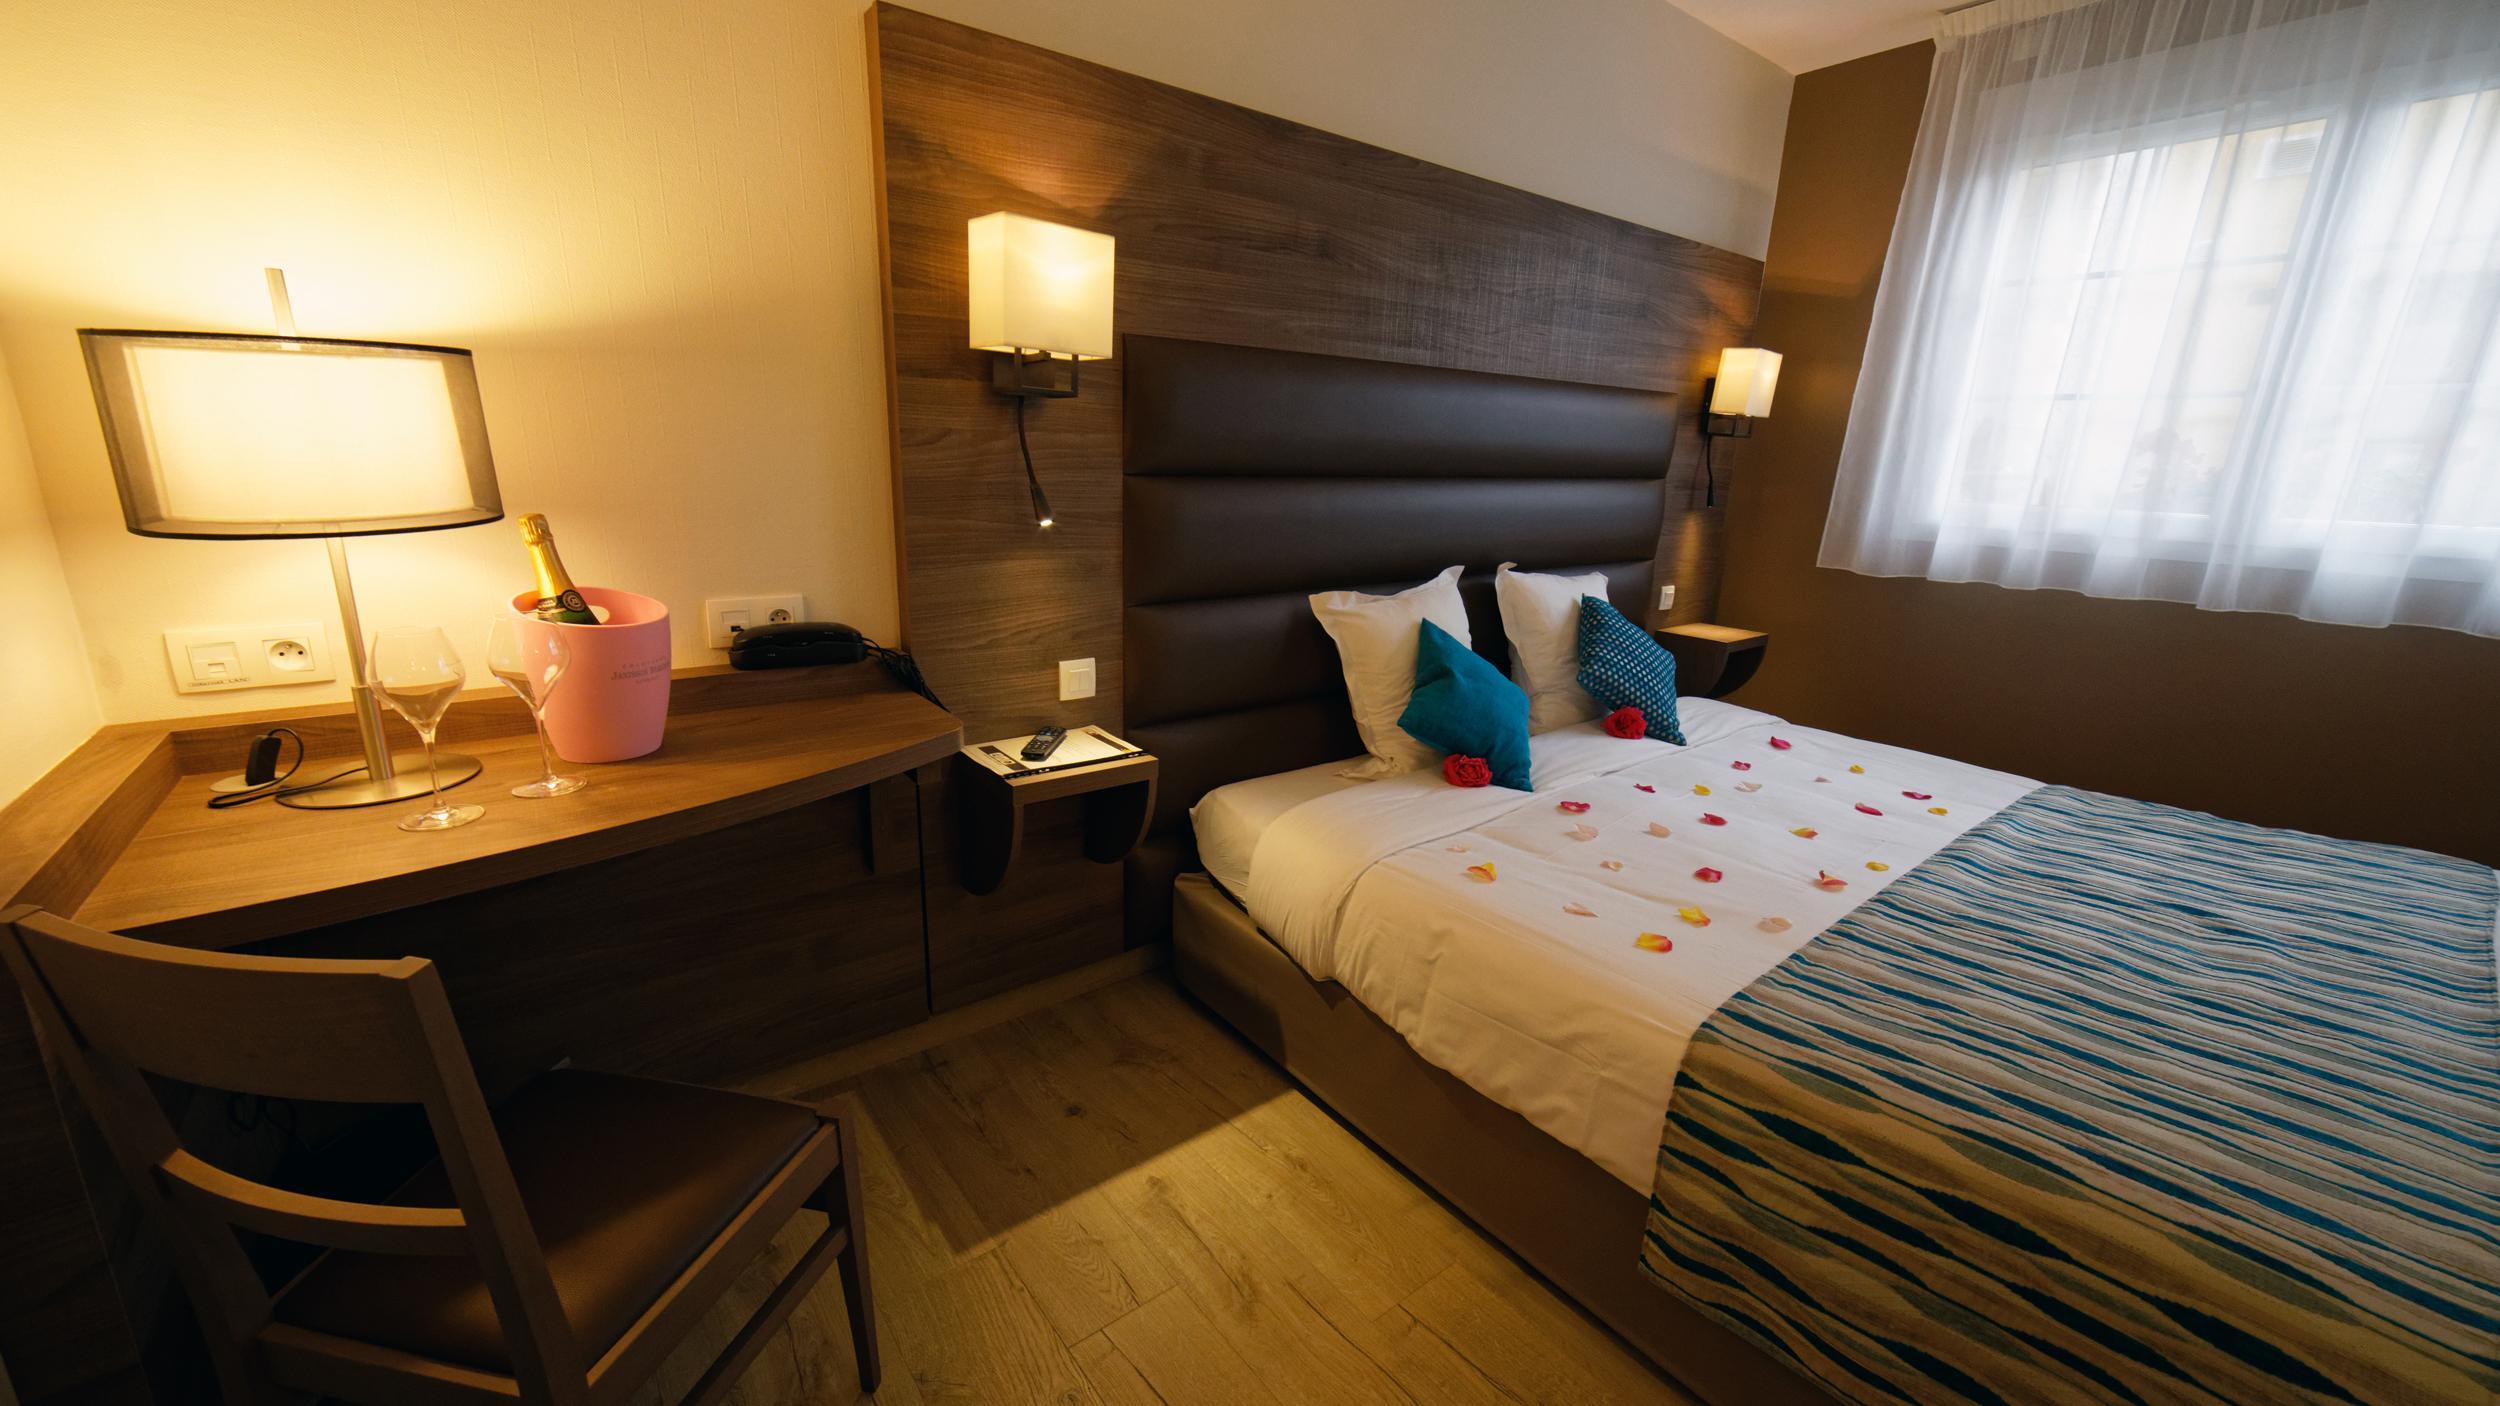 Tarifs chambre h tel matougues proche chalons en champagne for Tarifs hotel